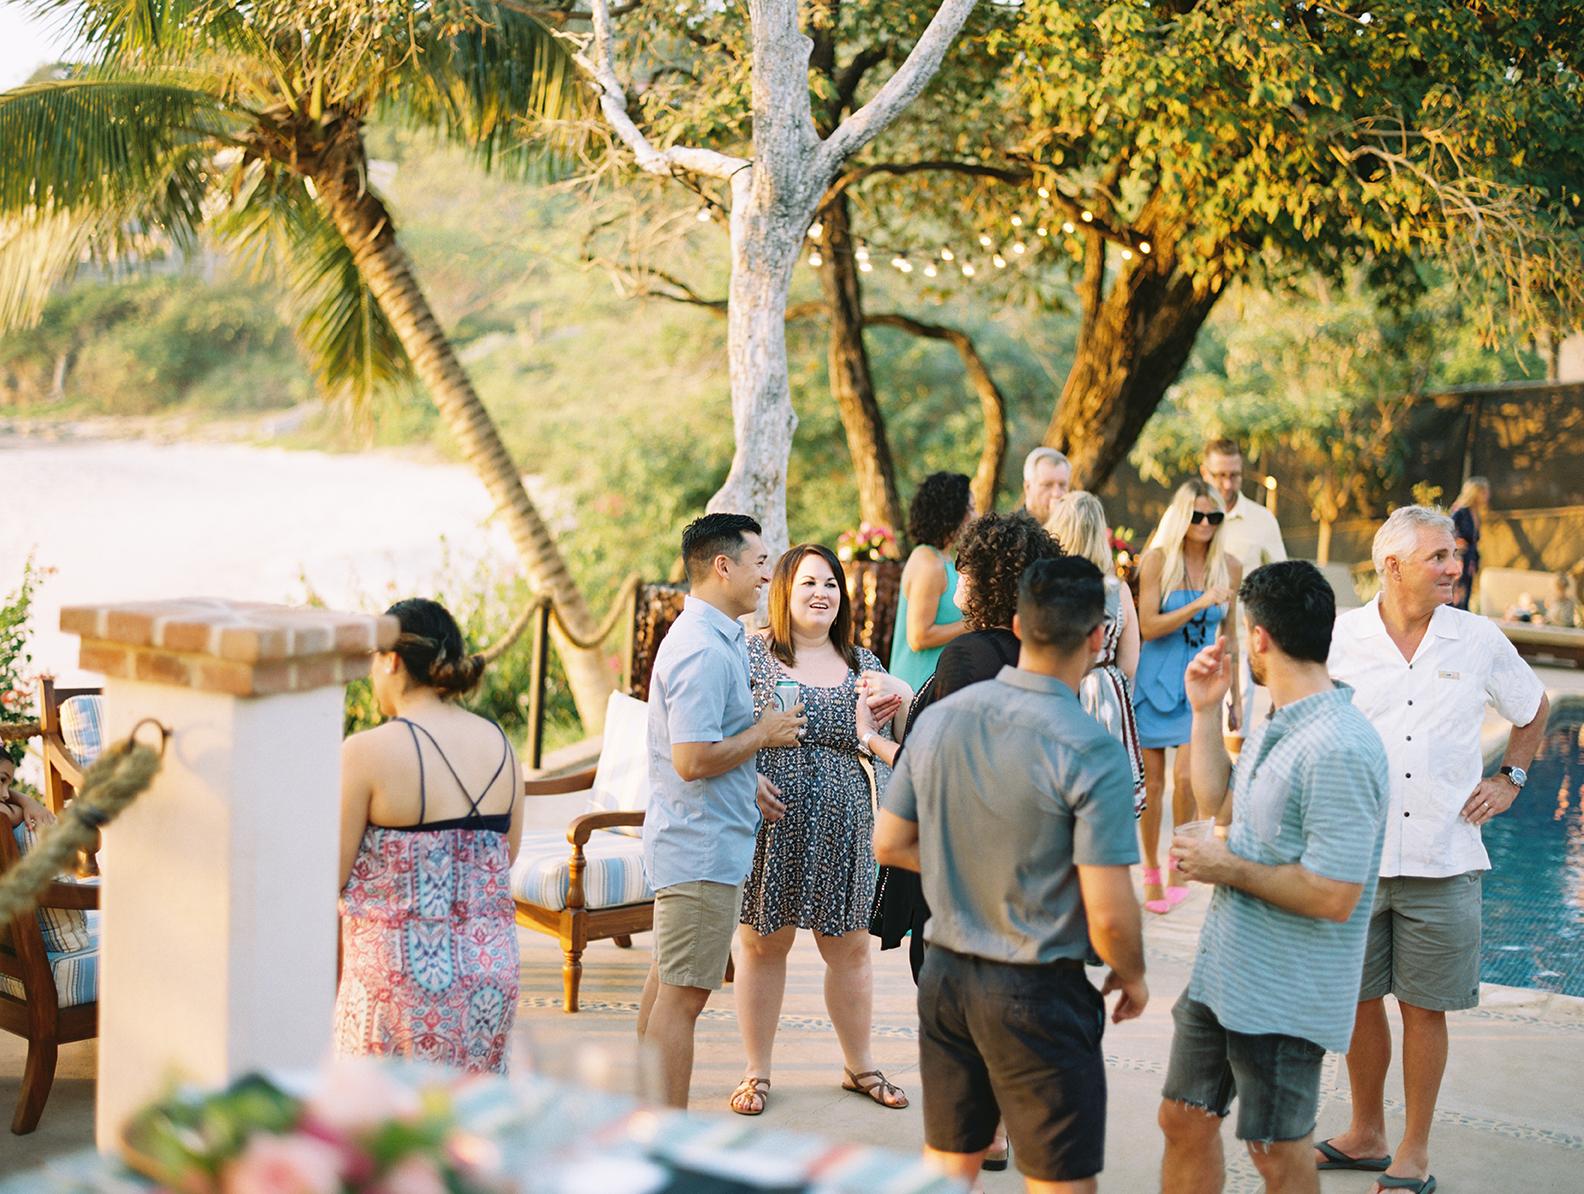 064-fine-art-film-photographer-wedding-engagement-jacob+cammye-destination-wedding-nicaragua-brumley & wells photography-rehearsal-dinner.jpg